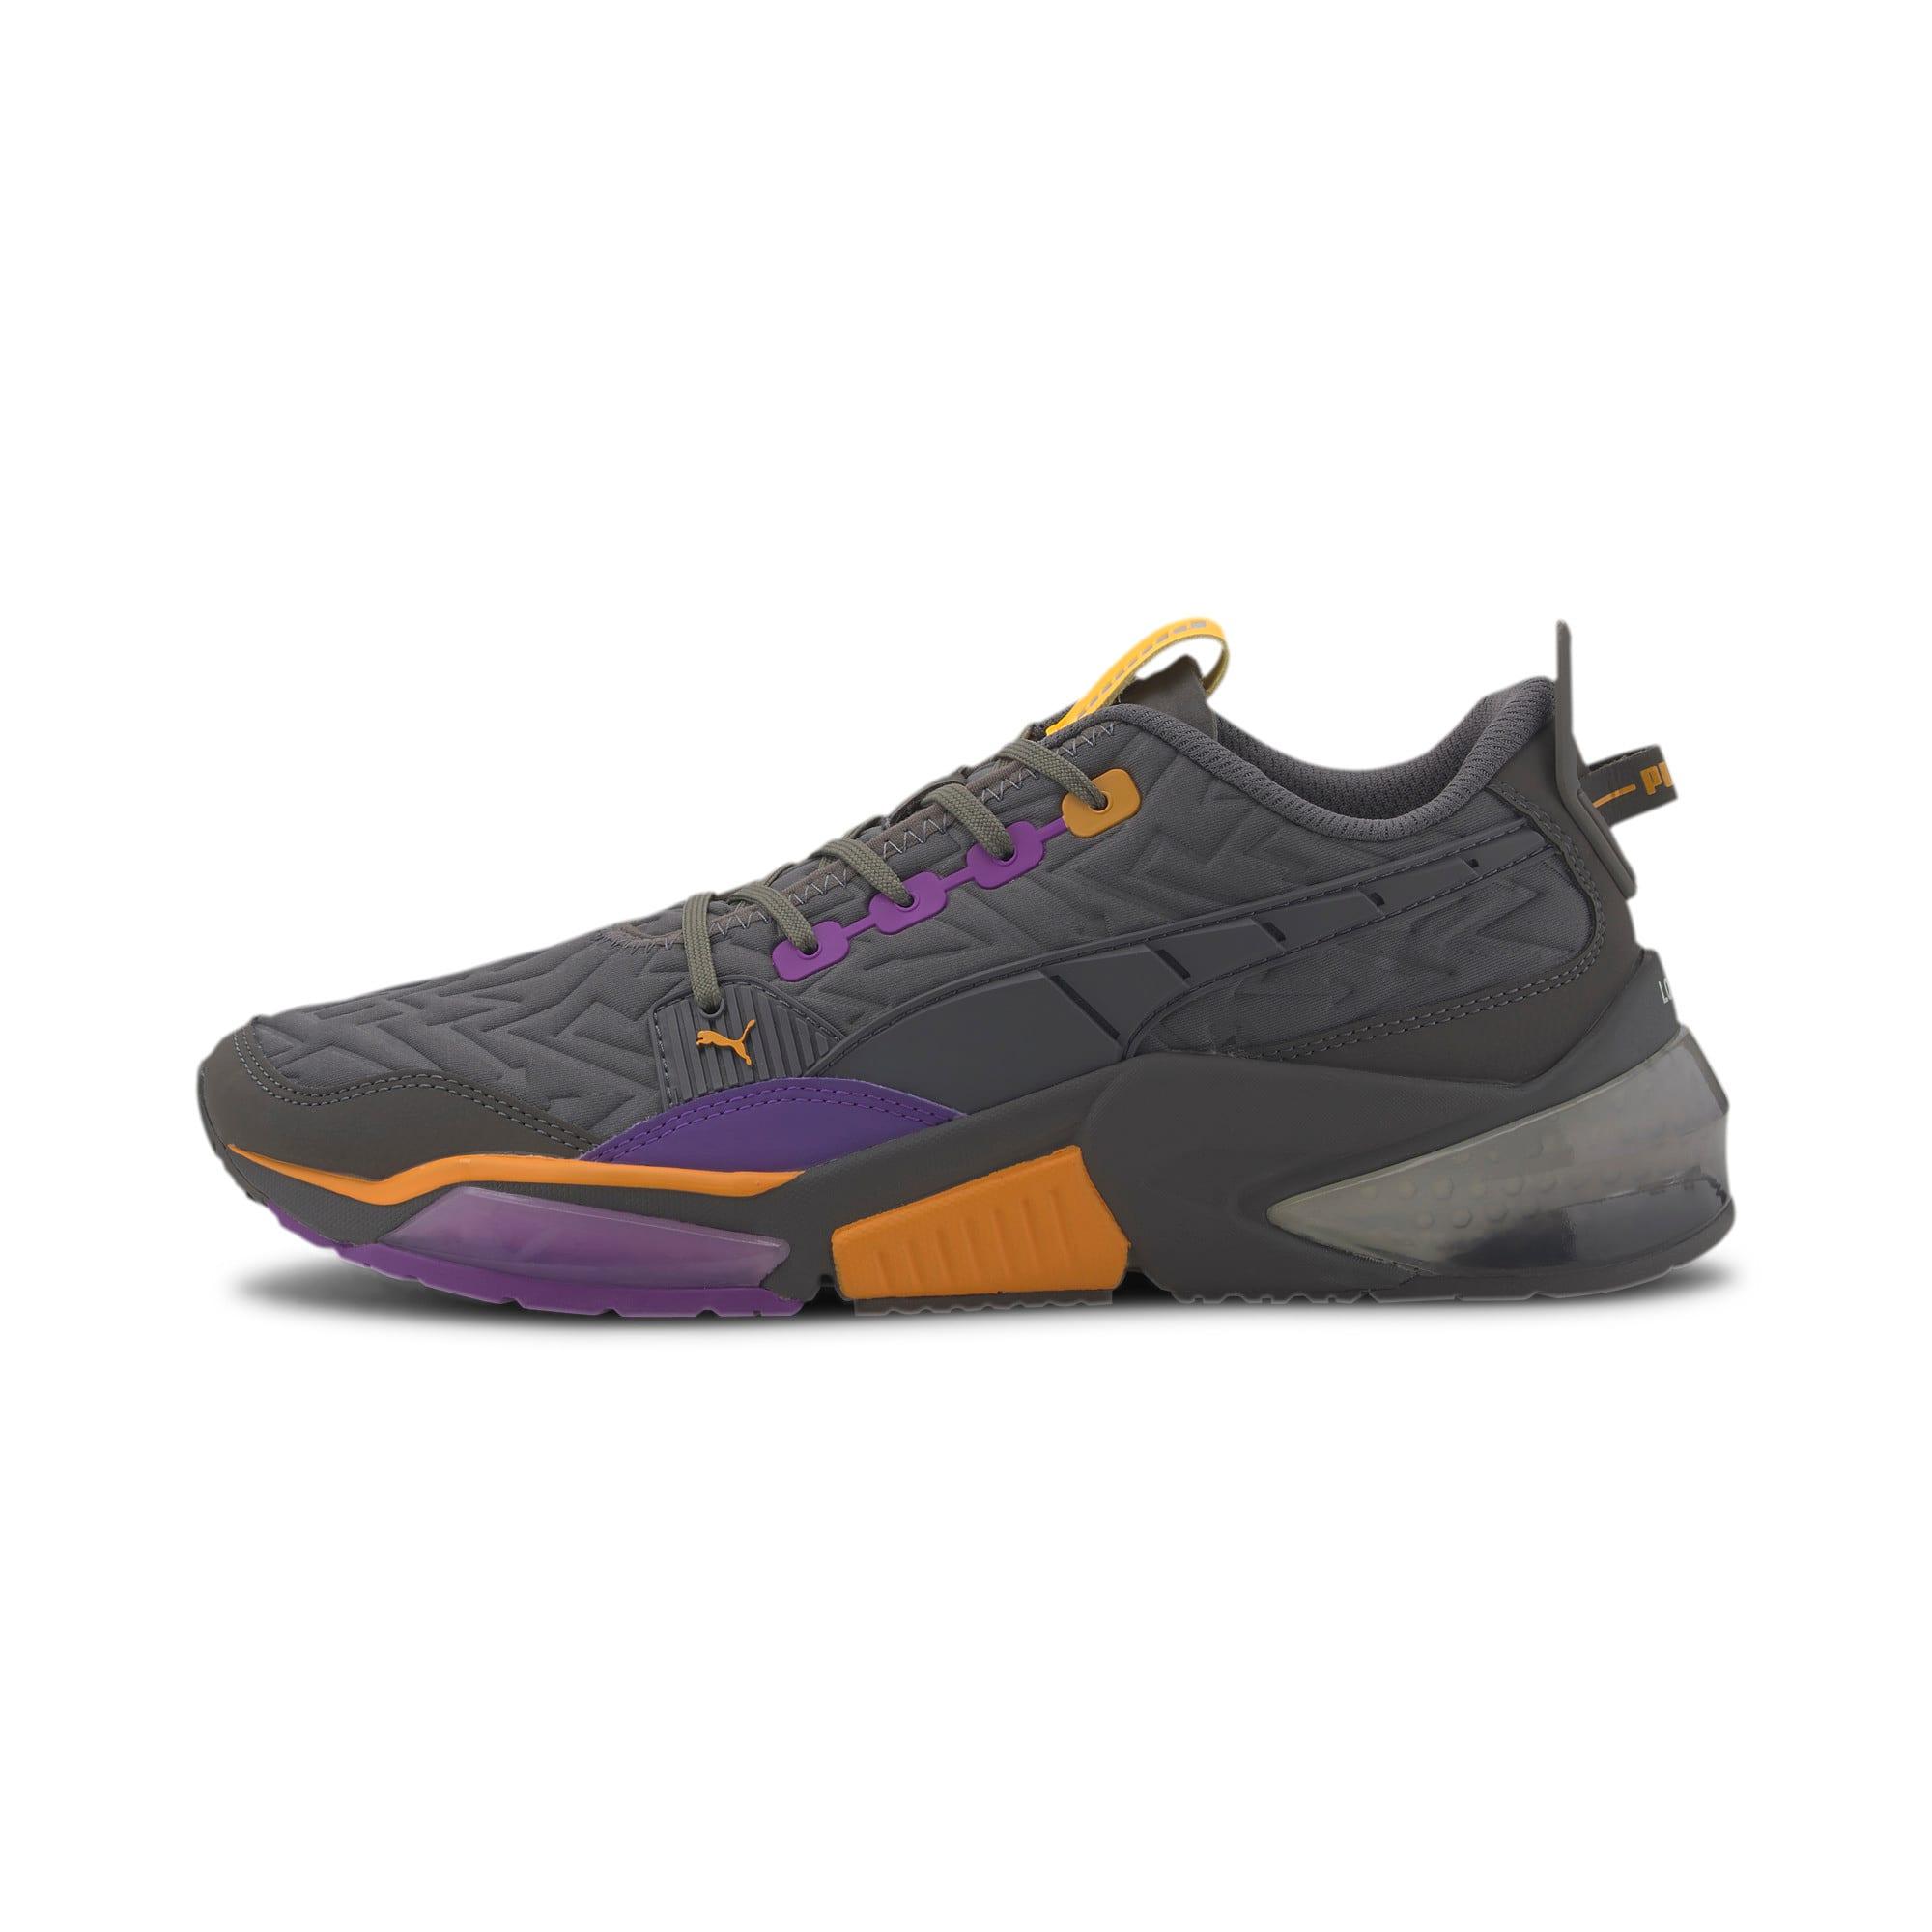 Thumbnail 1 of LQDCELL Optic Rave Men's Running Shoes, CASTLEROCK-Purple Glimmer, medium